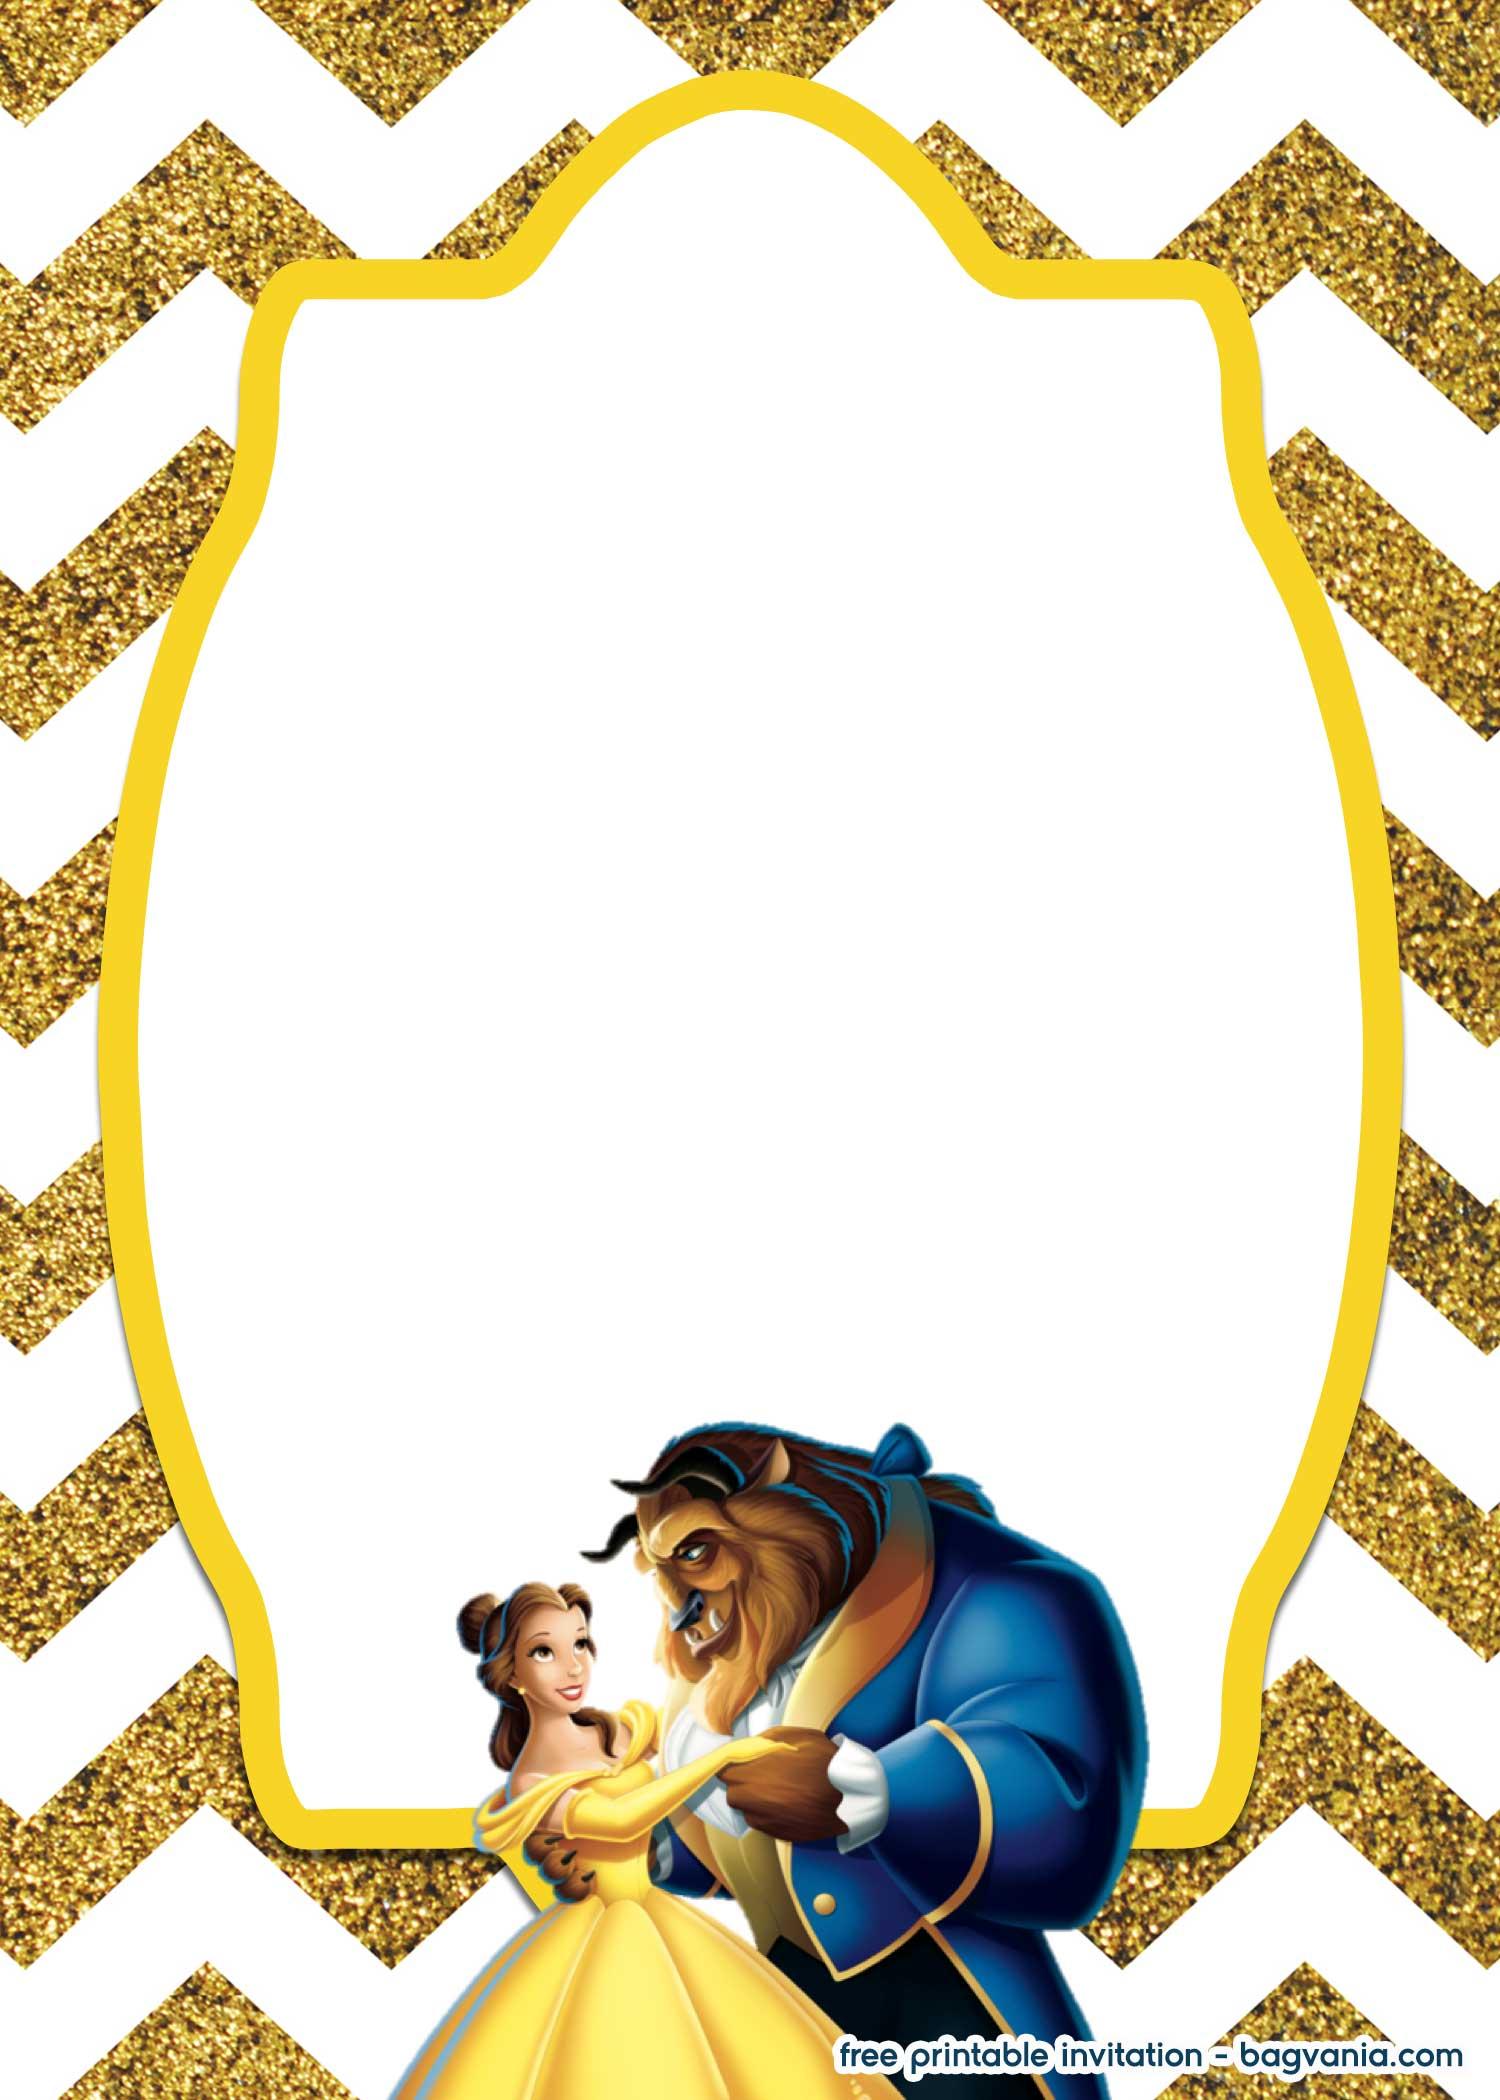 Free Royal Beauty And The Beast Invitation Template Bagvania